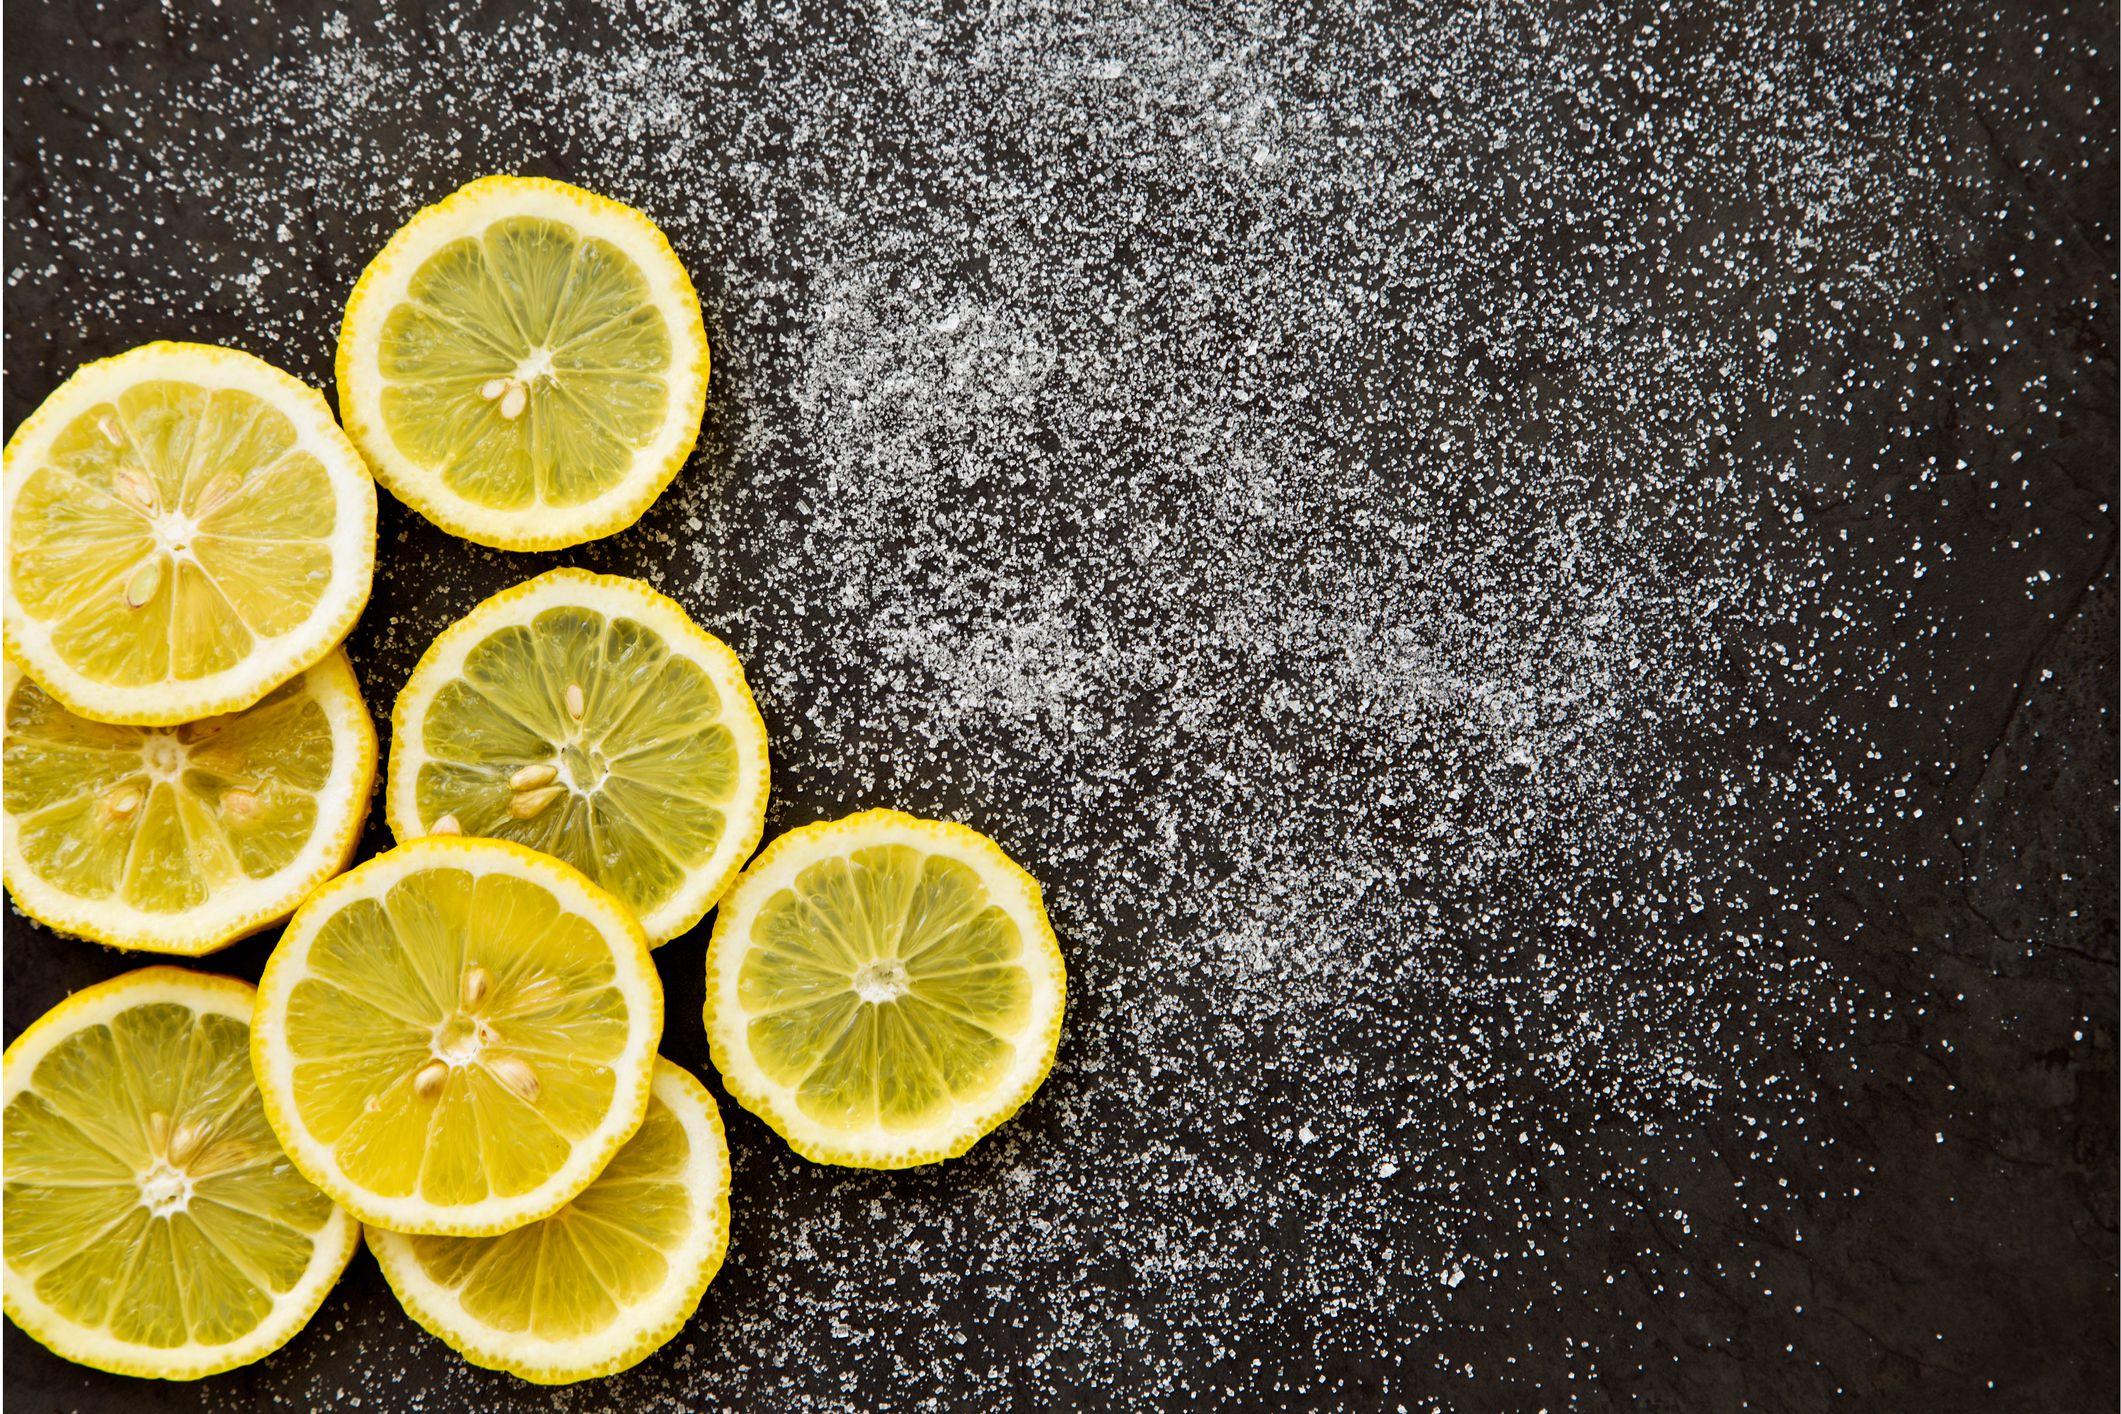 Lemon slices against a black background.